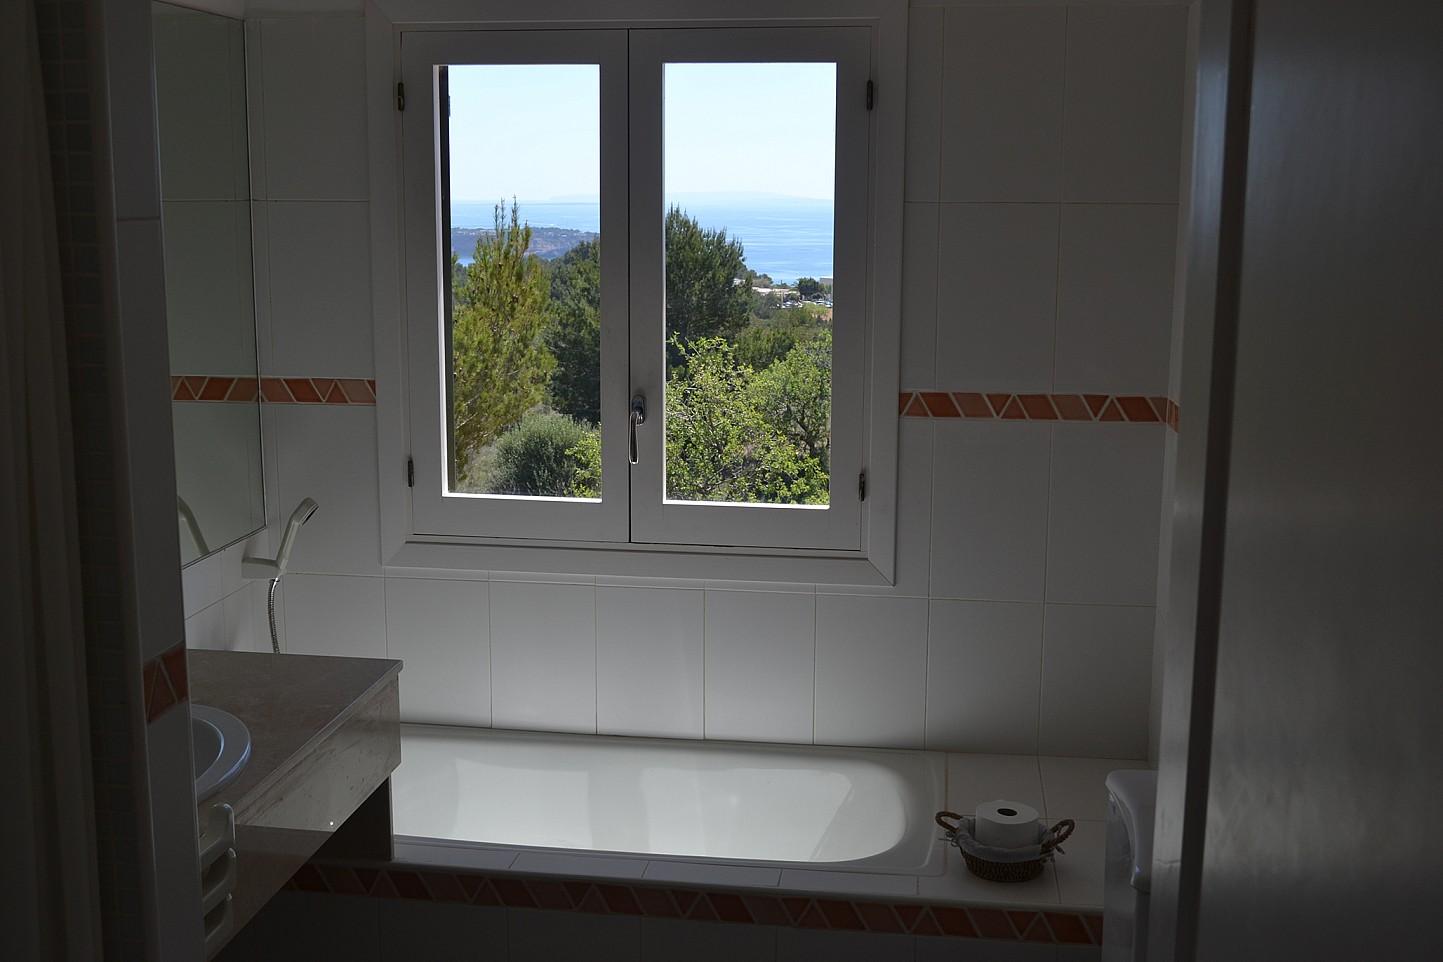 Ванная комната виллы в Эс Кубельс